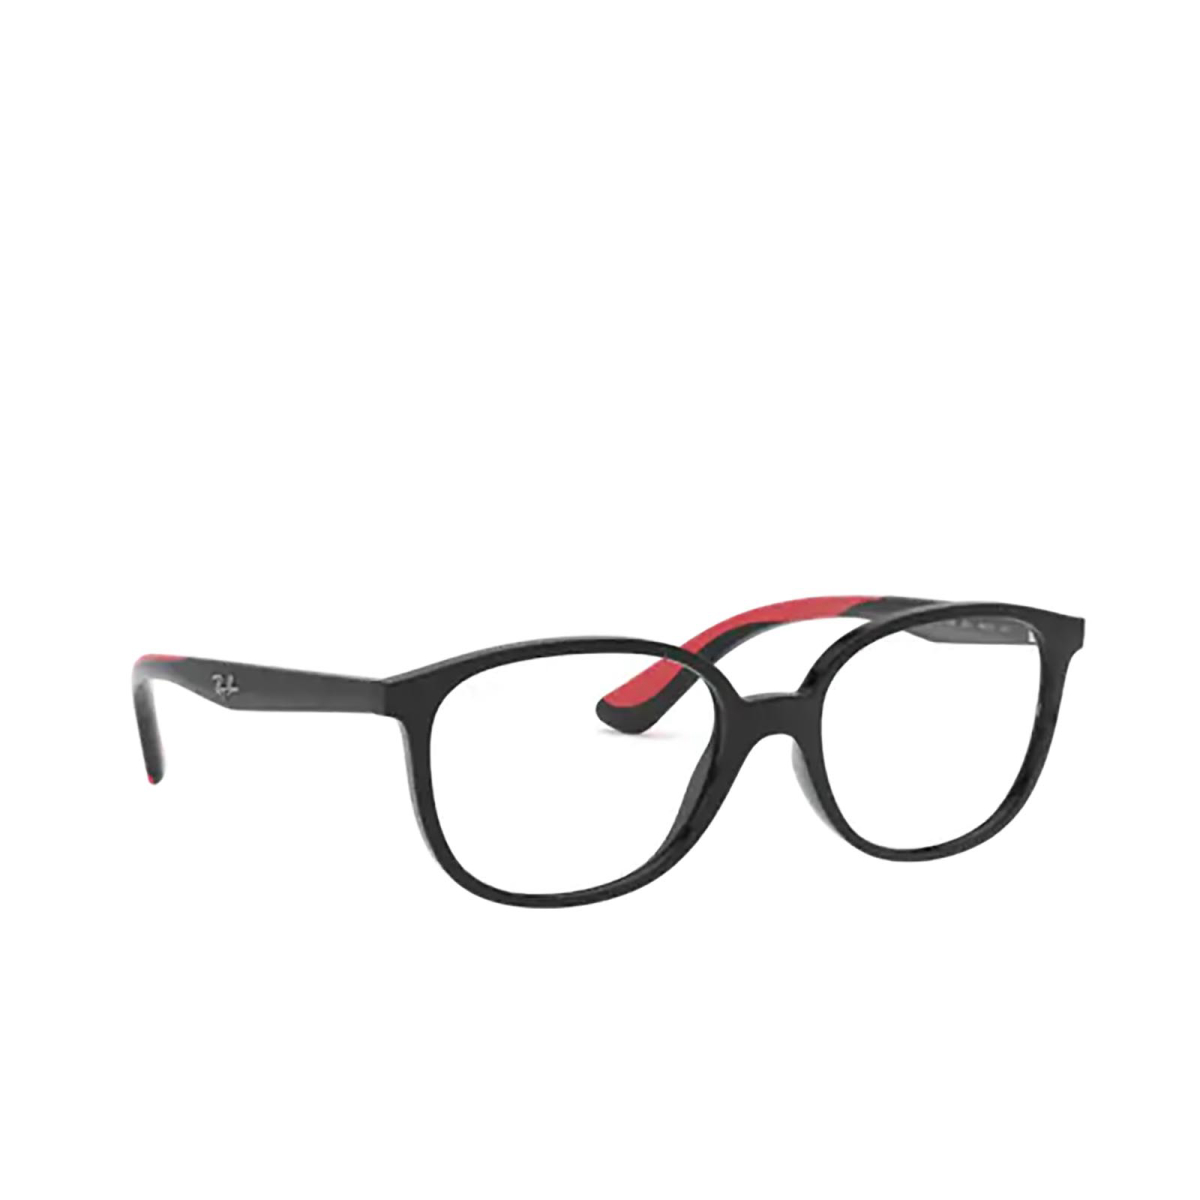 Ray-Ban® Square Eyeglasses: RY1598 color Black 3831.